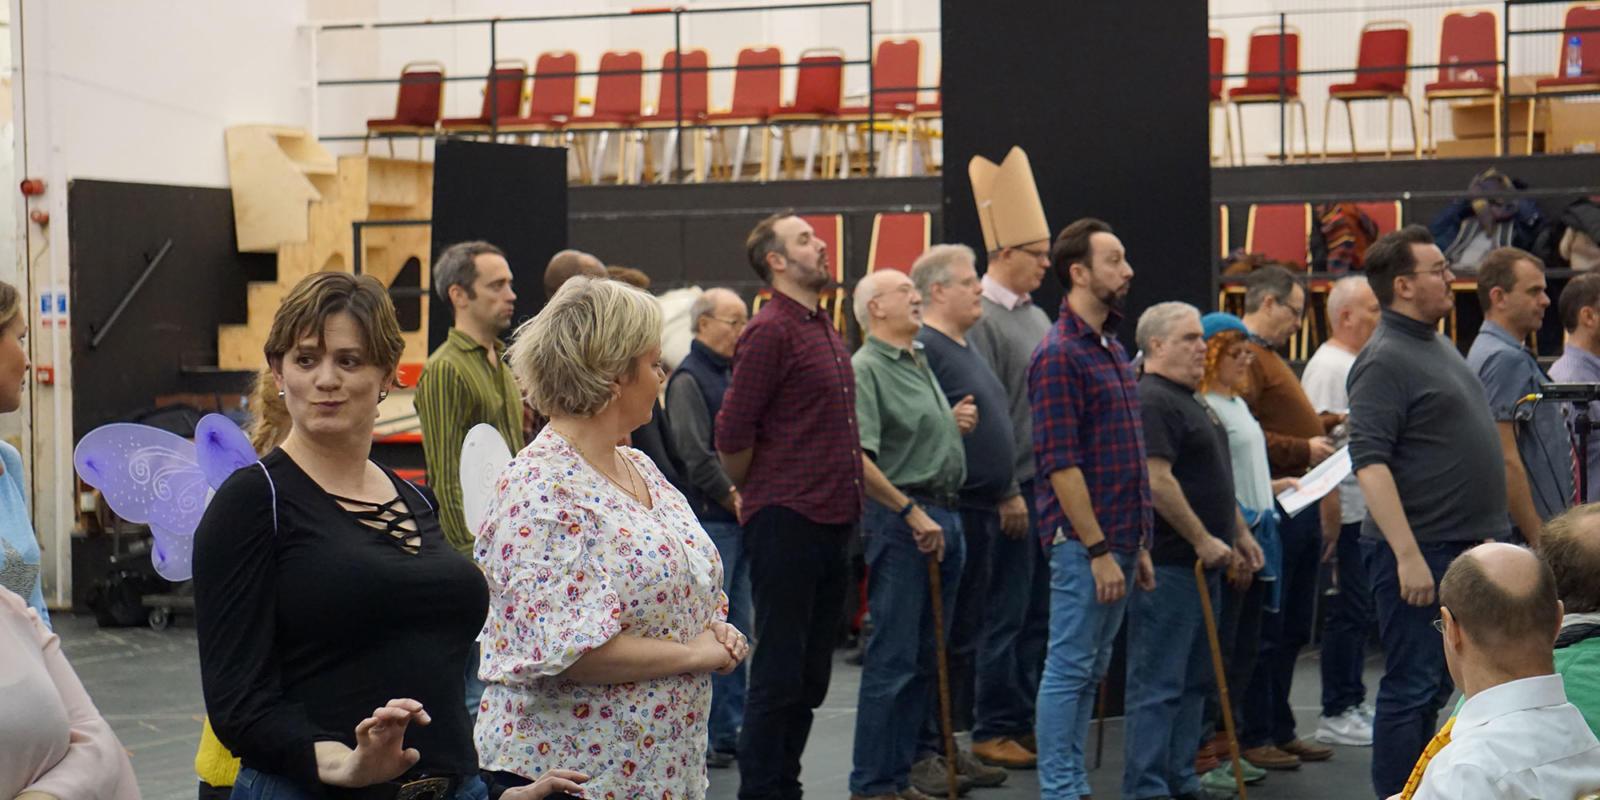 ENO Iolanthe: members of the ENO Chorus